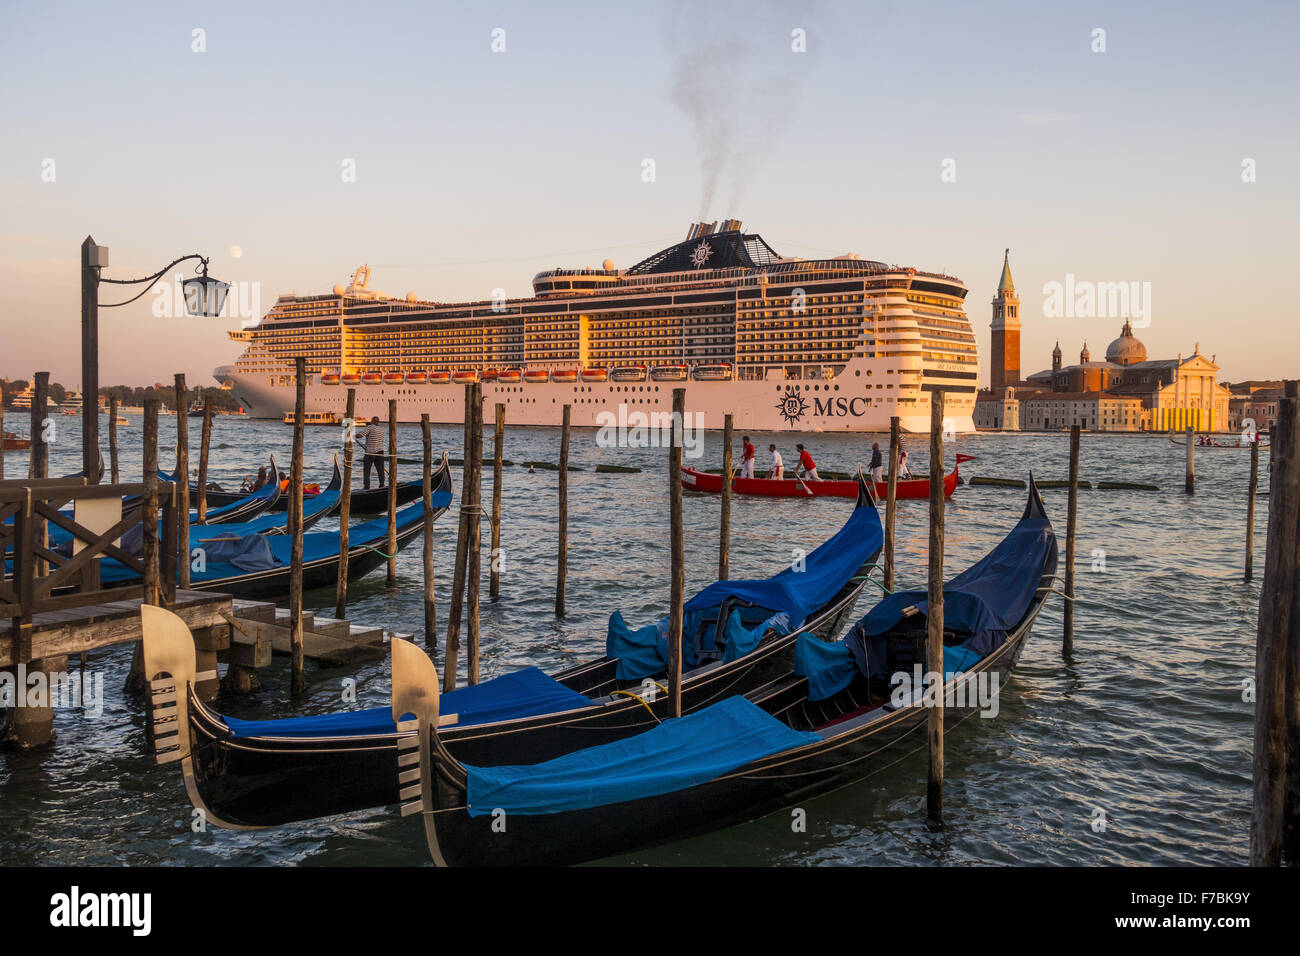 MSC Fantasia, Cruise Ship, Venedig, Venice, Venetia, Italy - Stock Image